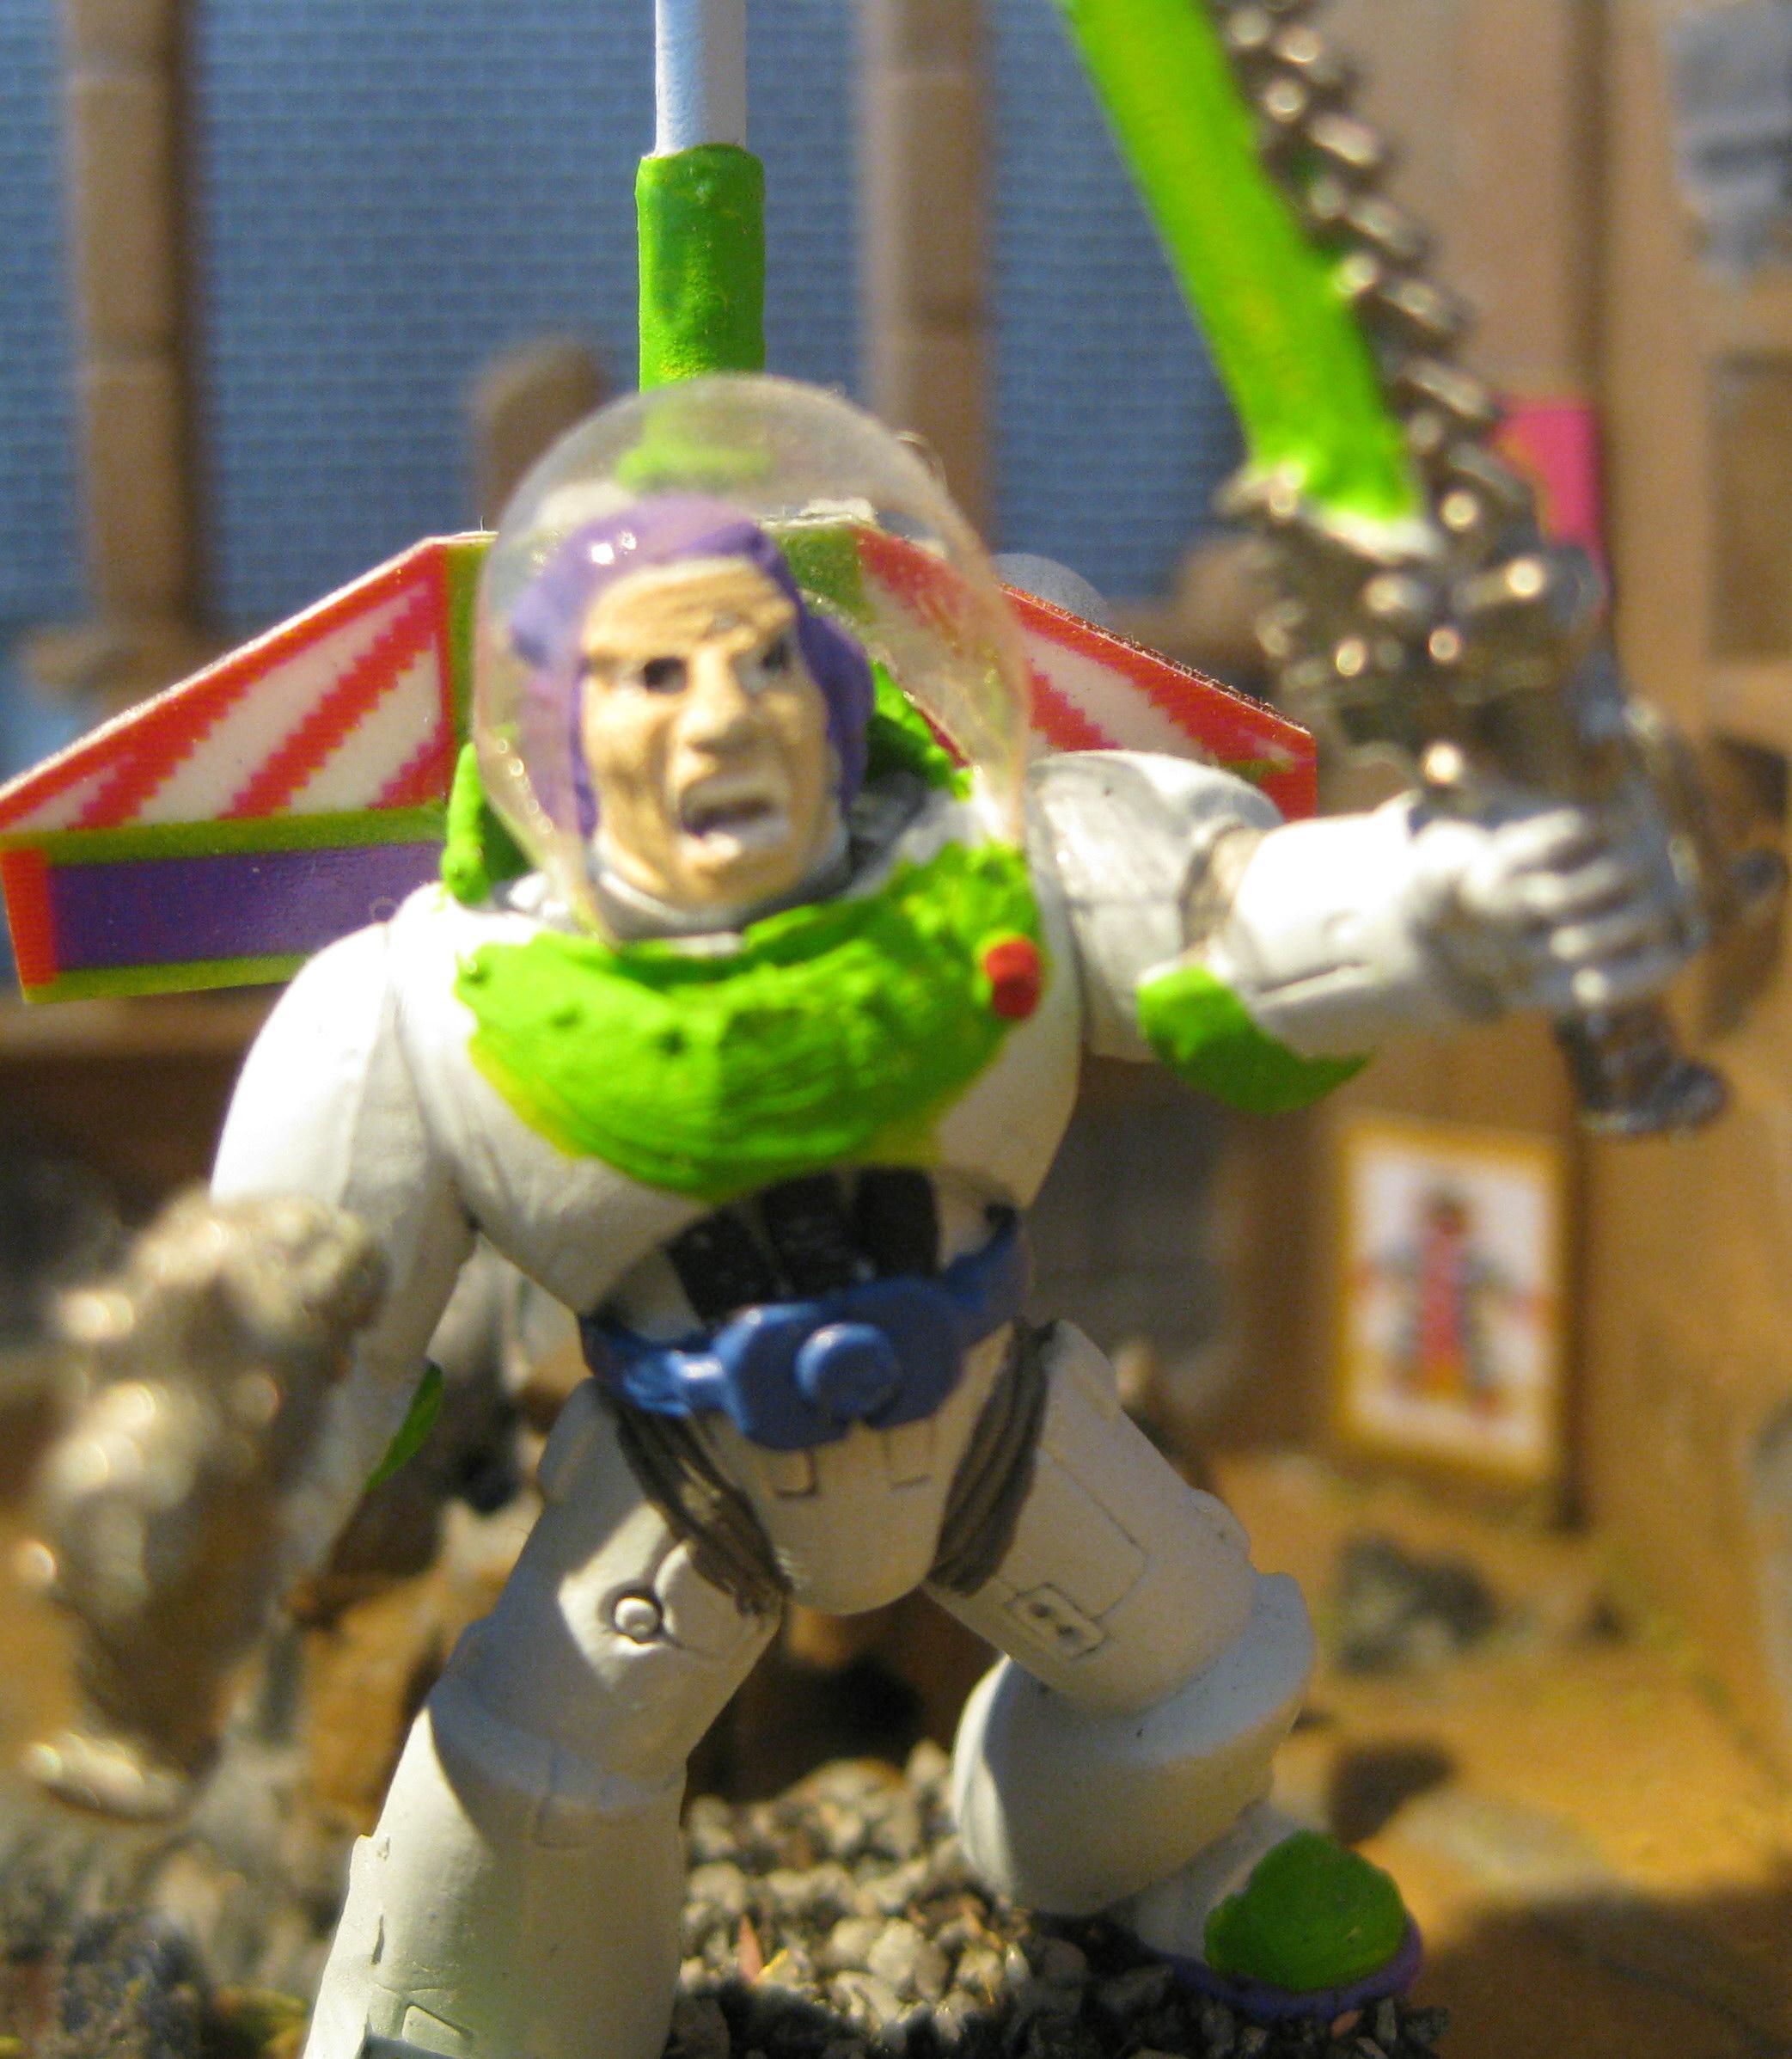 Buzz Lightyear, Cute, Disney, Humor, Space Marines